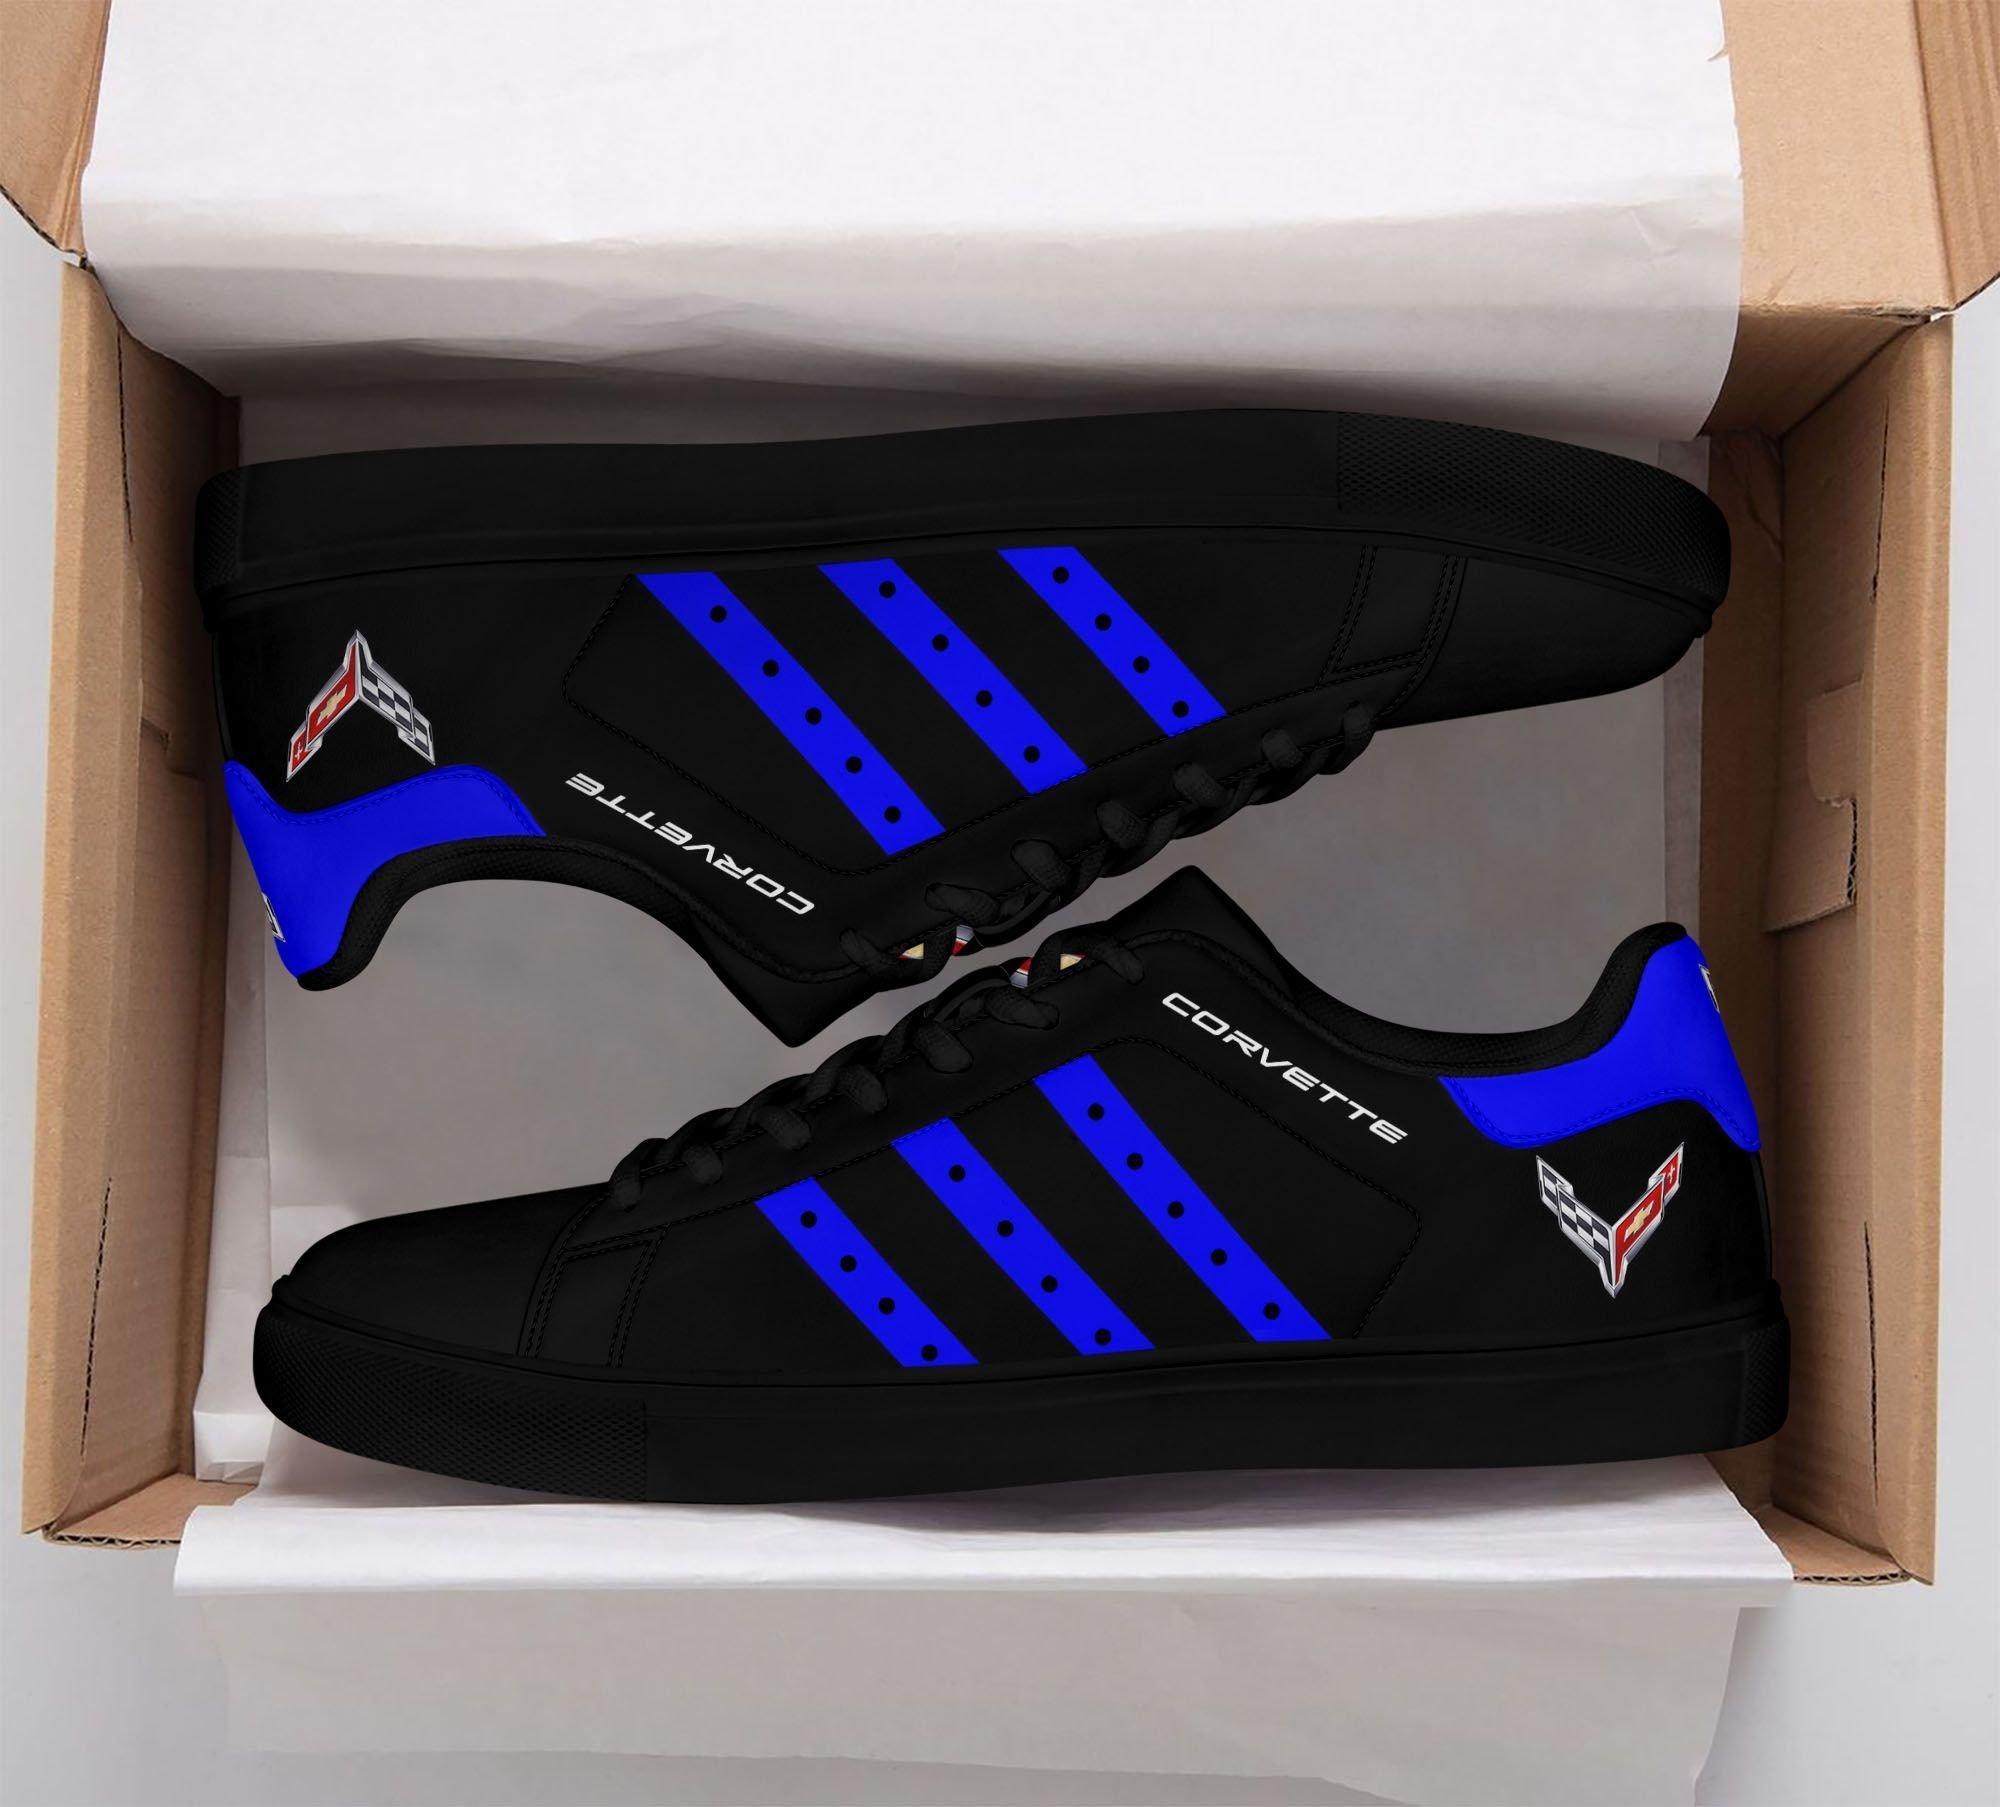 Chevrolet Corvette Blue Stripe Line in Black Stan Smith Shoes